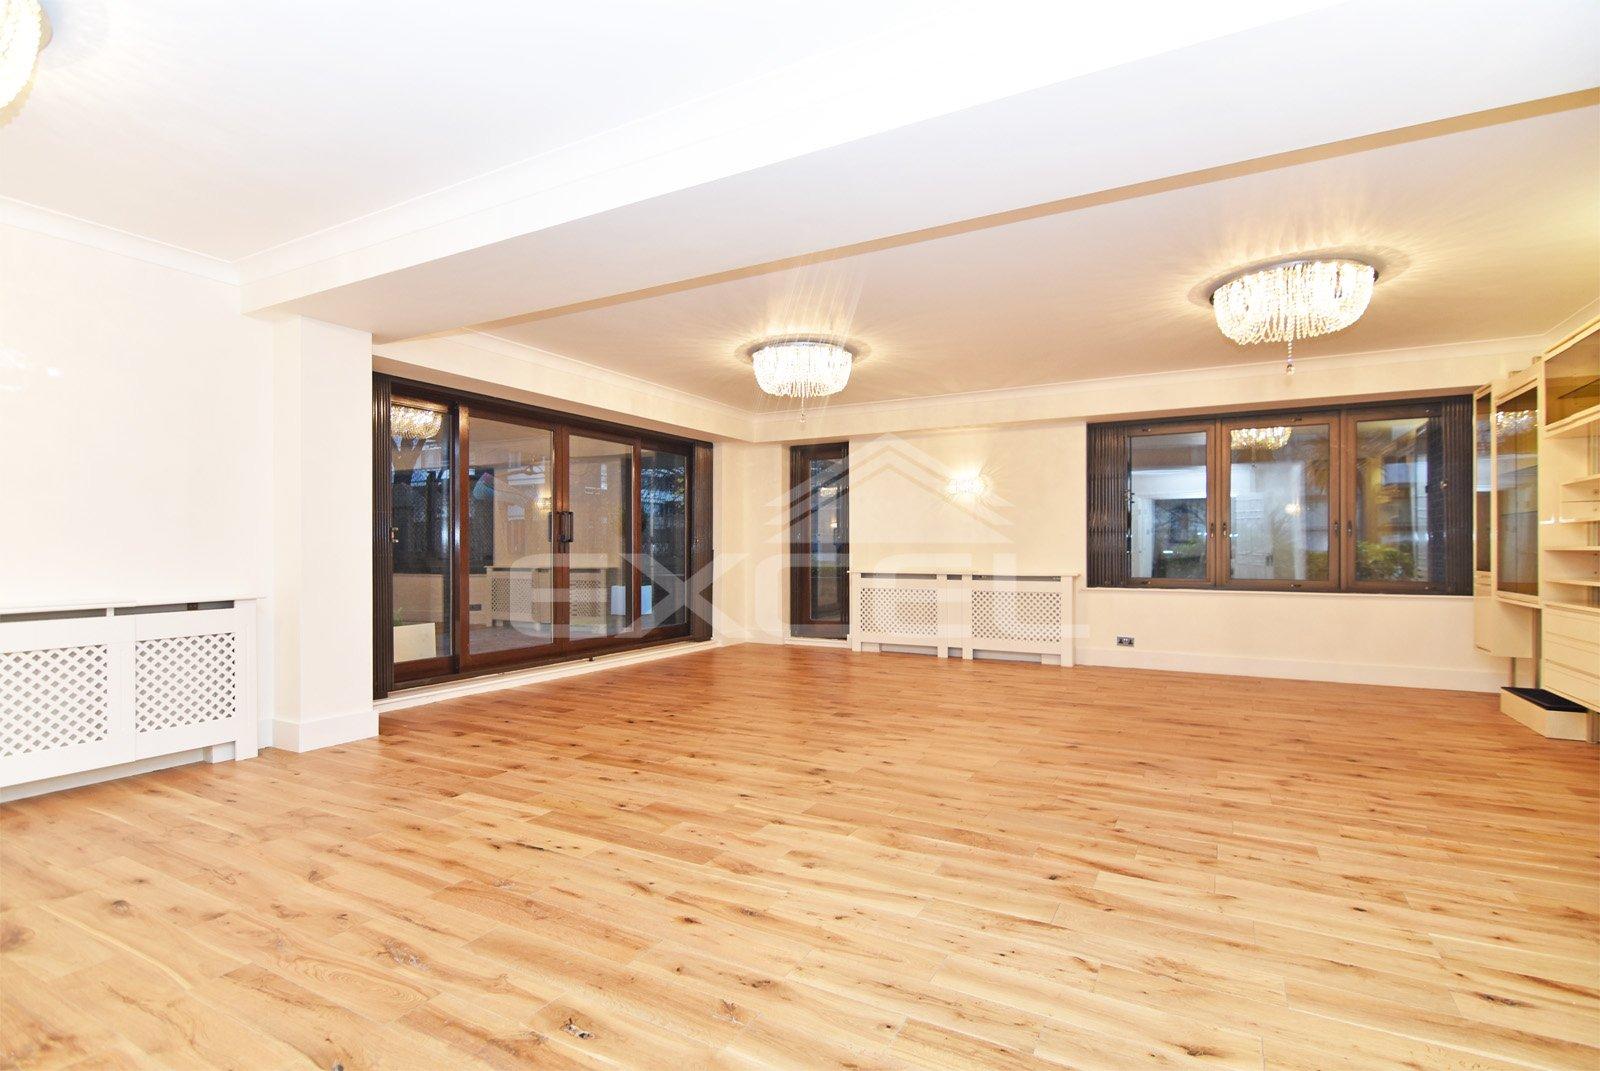 Room On Rent In Prince Albert